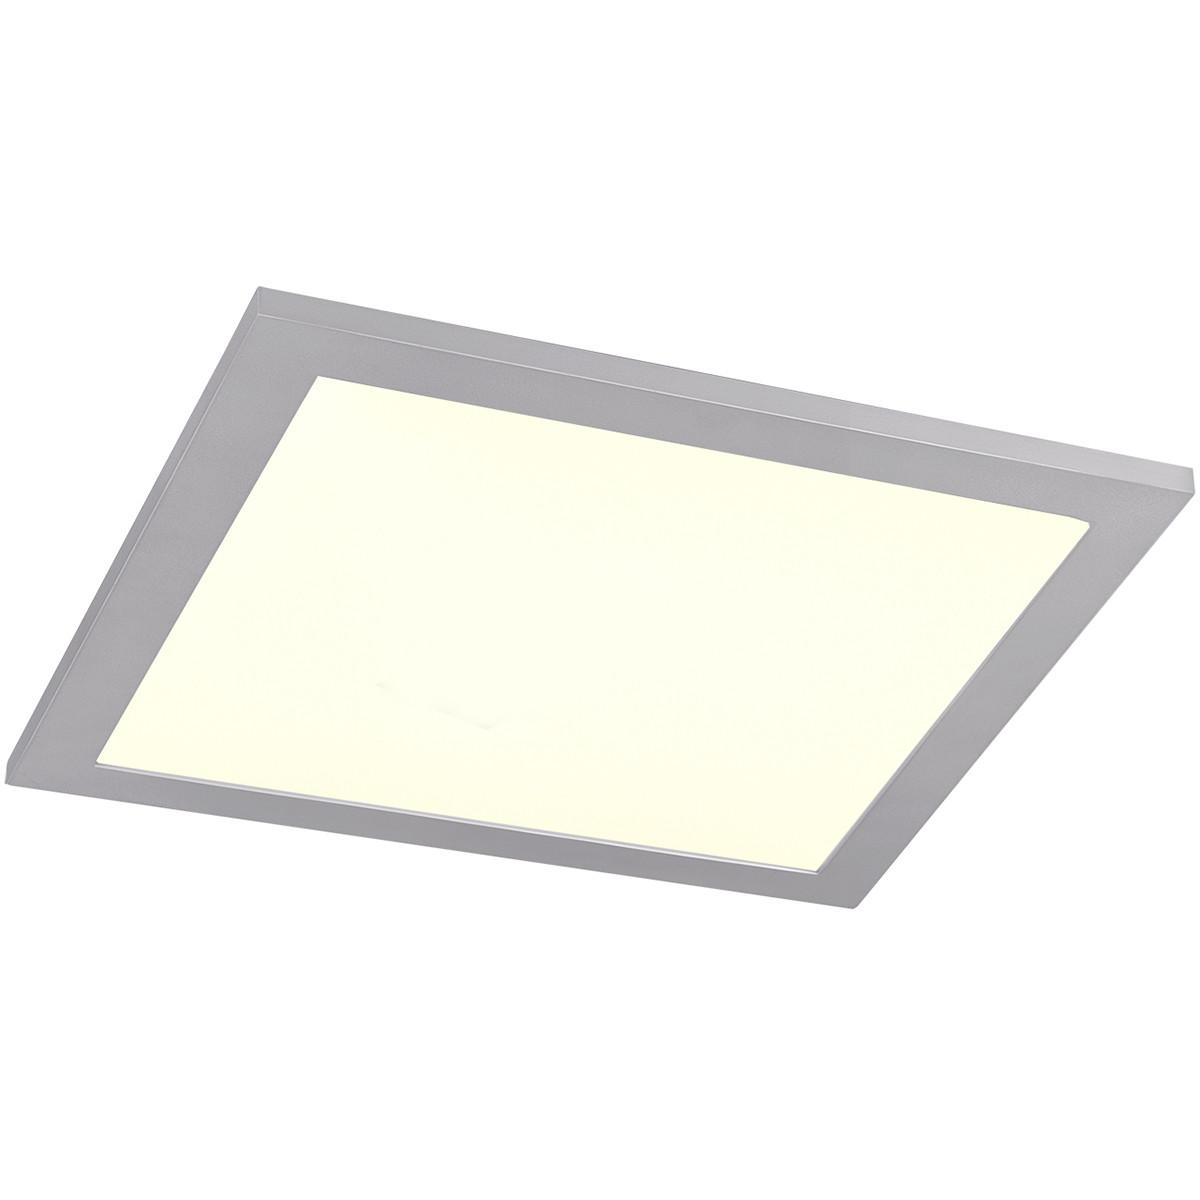 LED Plafondlamp WiZ - Smart LED - Trion Alineon - Slimme LED - Dimbaar - Aanpasbare Kleur - 15W - Ma